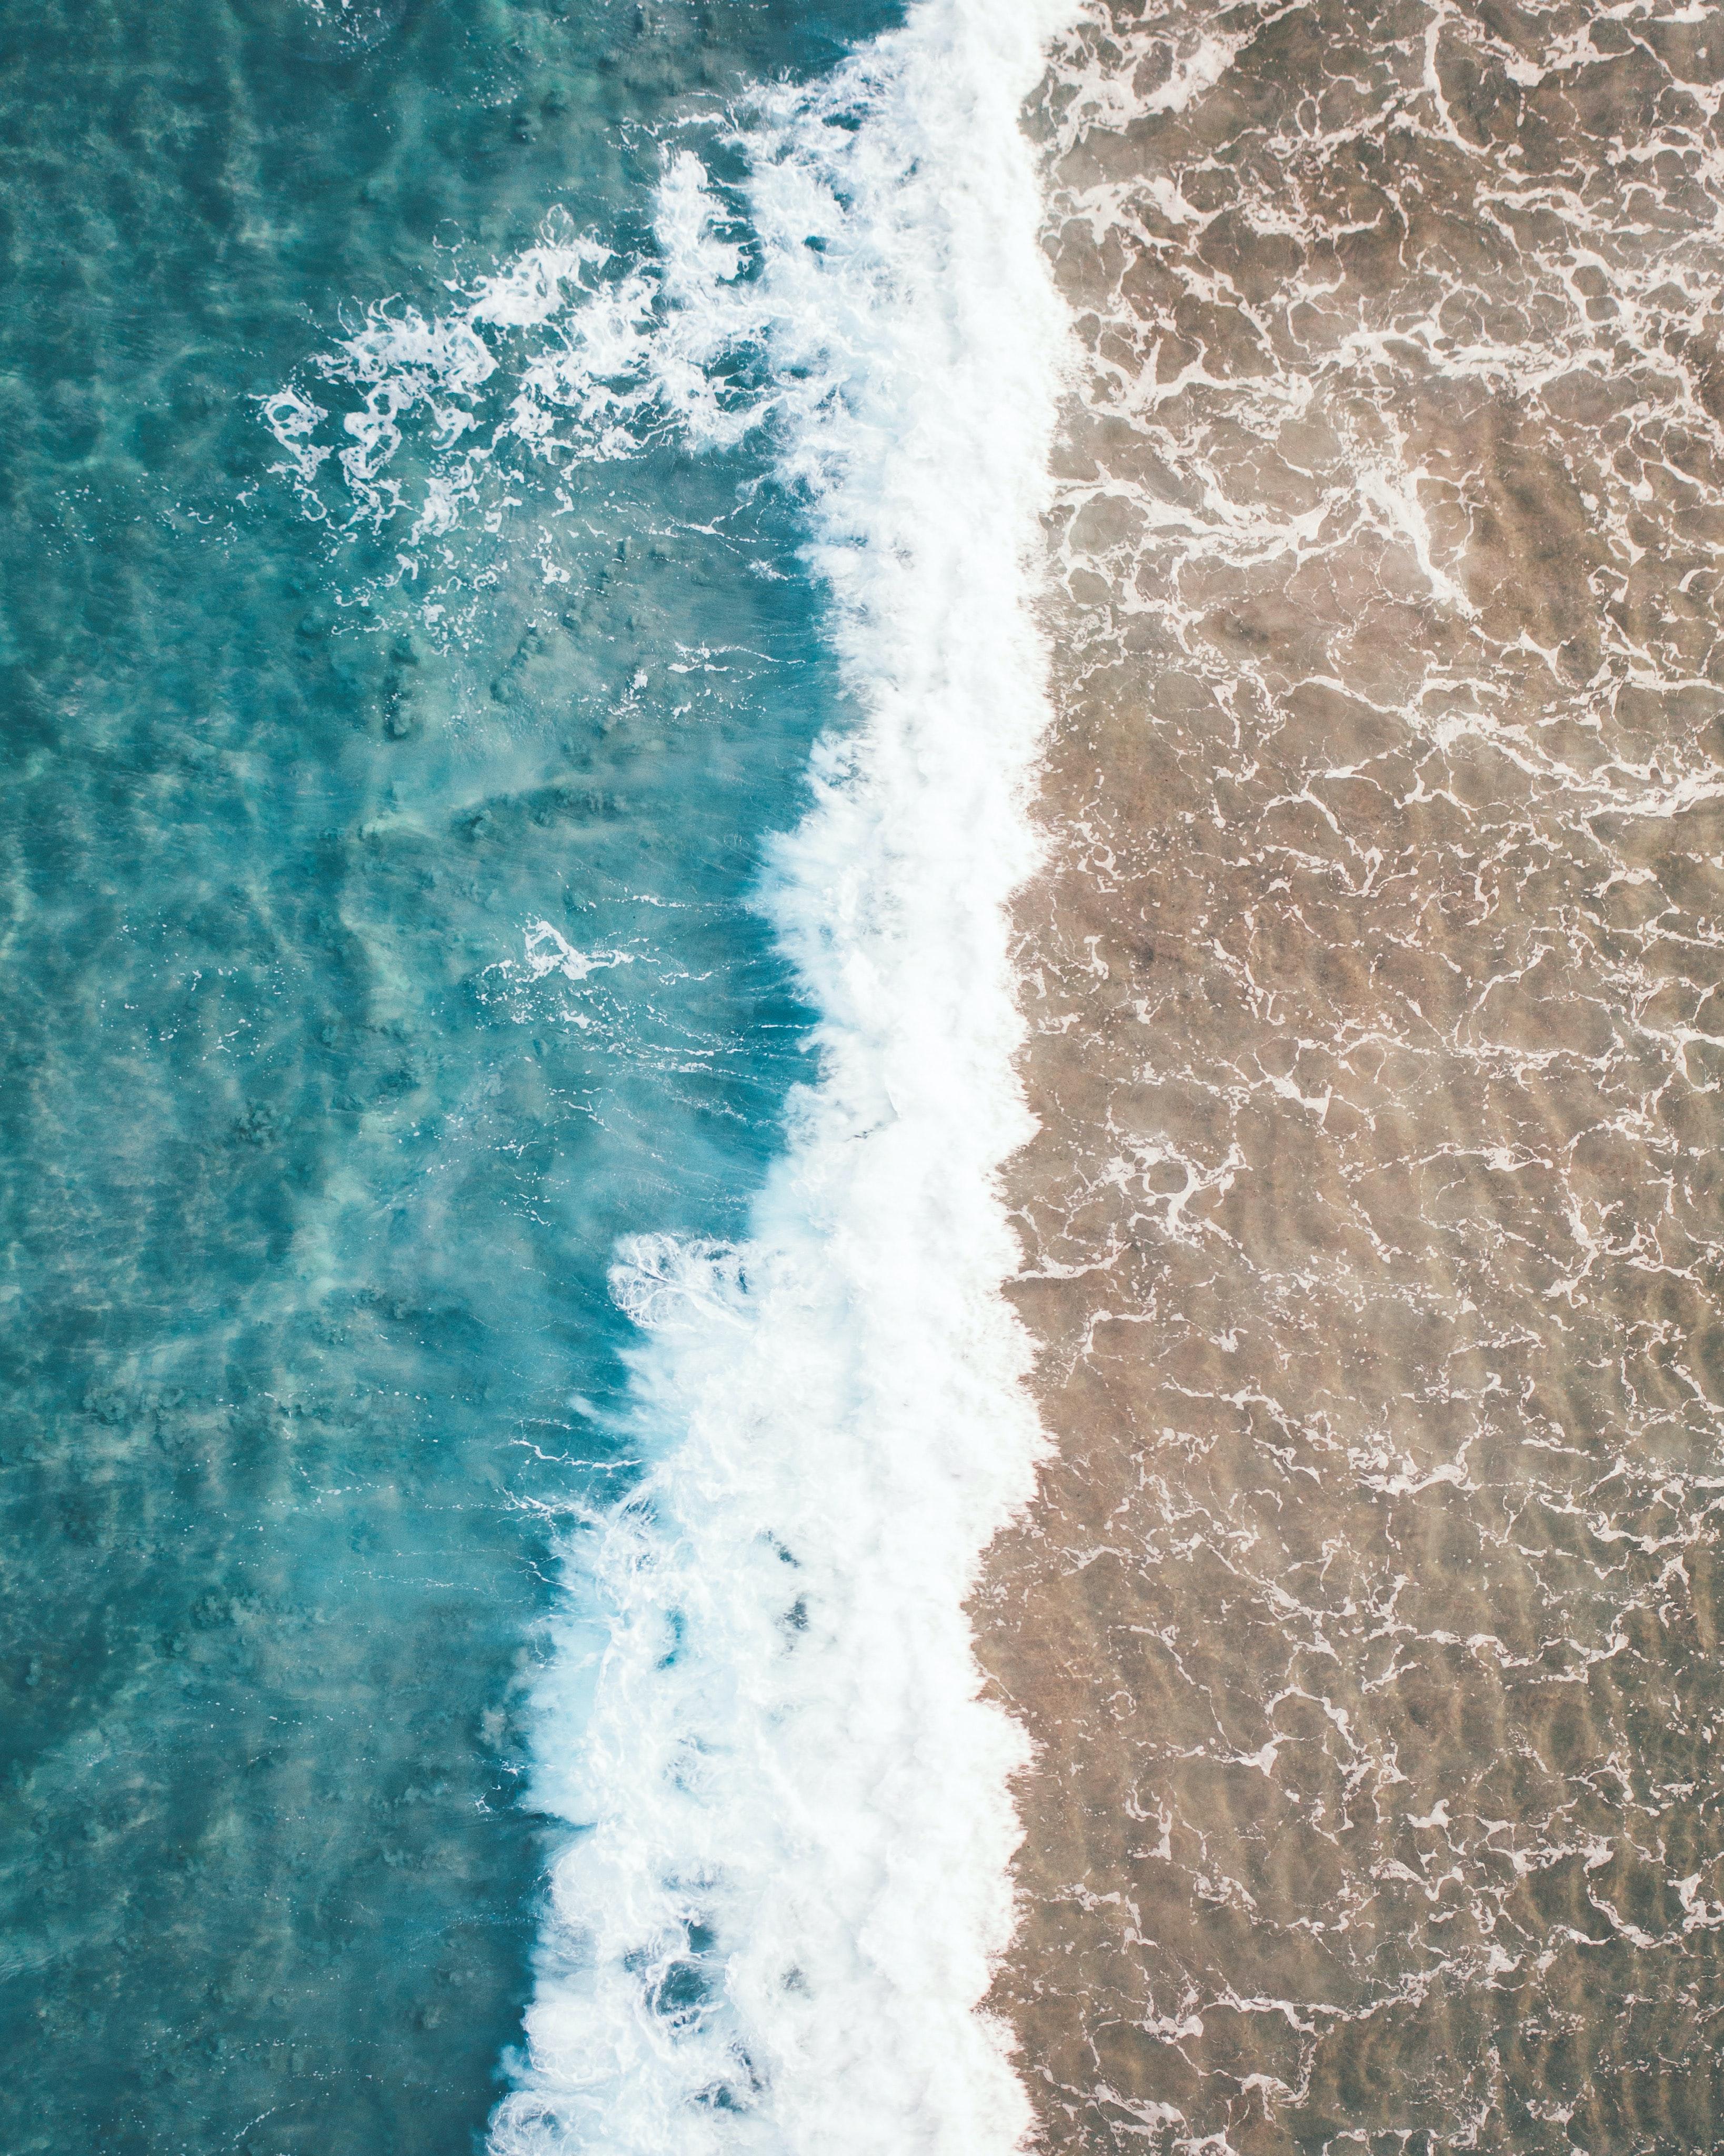 60403 Salvapantallas y fondos de pantalla Mar en tu teléfono. Descarga imágenes de Naturaleza, Mar, Onda, Ola, Vista Desde Arriba, Agua, Arena gratis